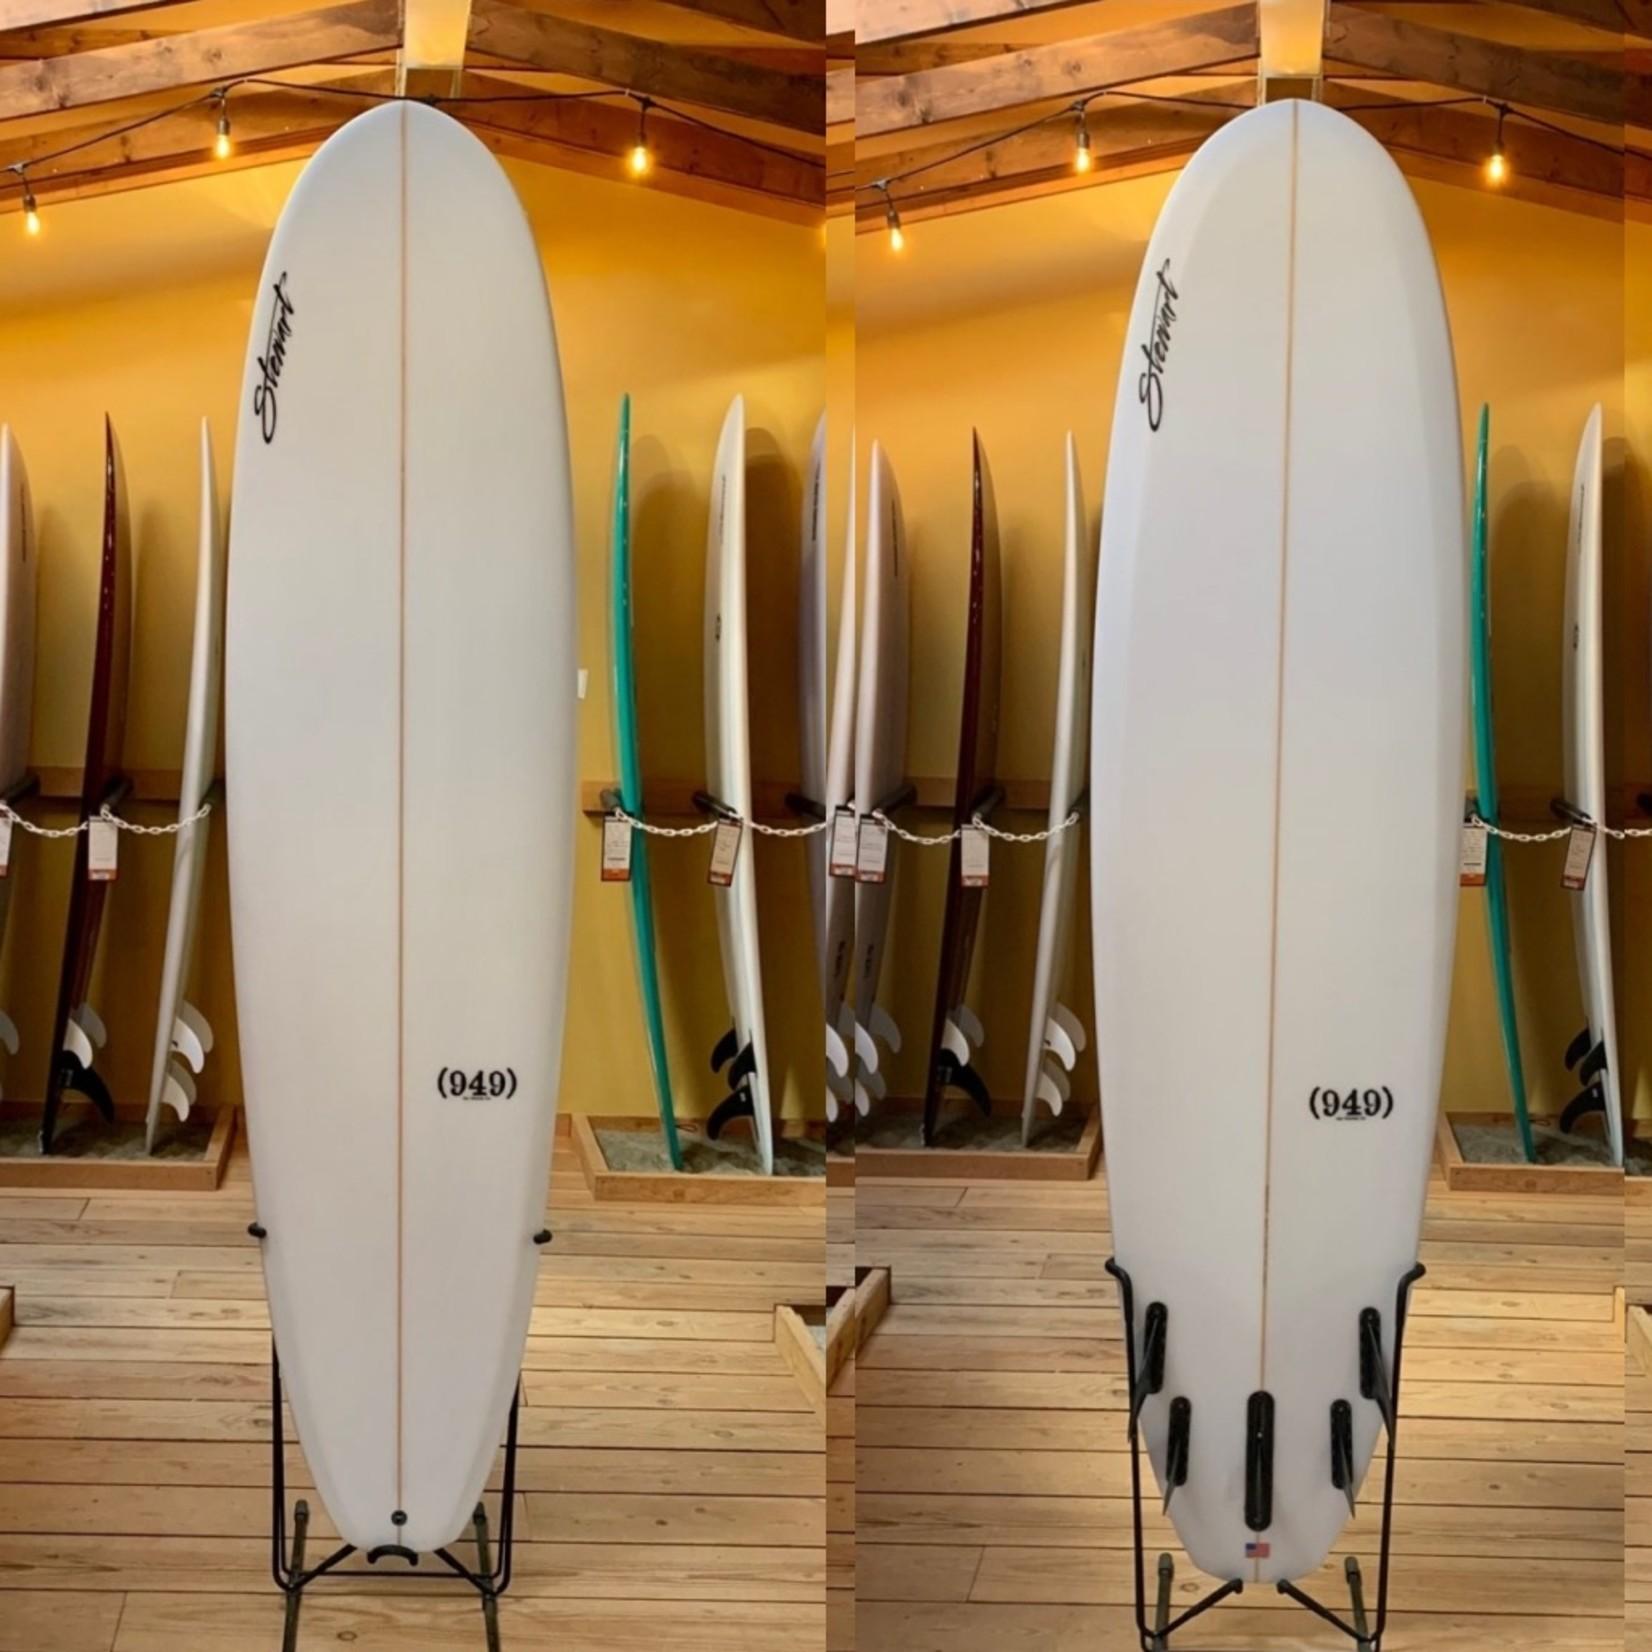 Stewart Surfboards 7'0 (949) Performance Surfboard.